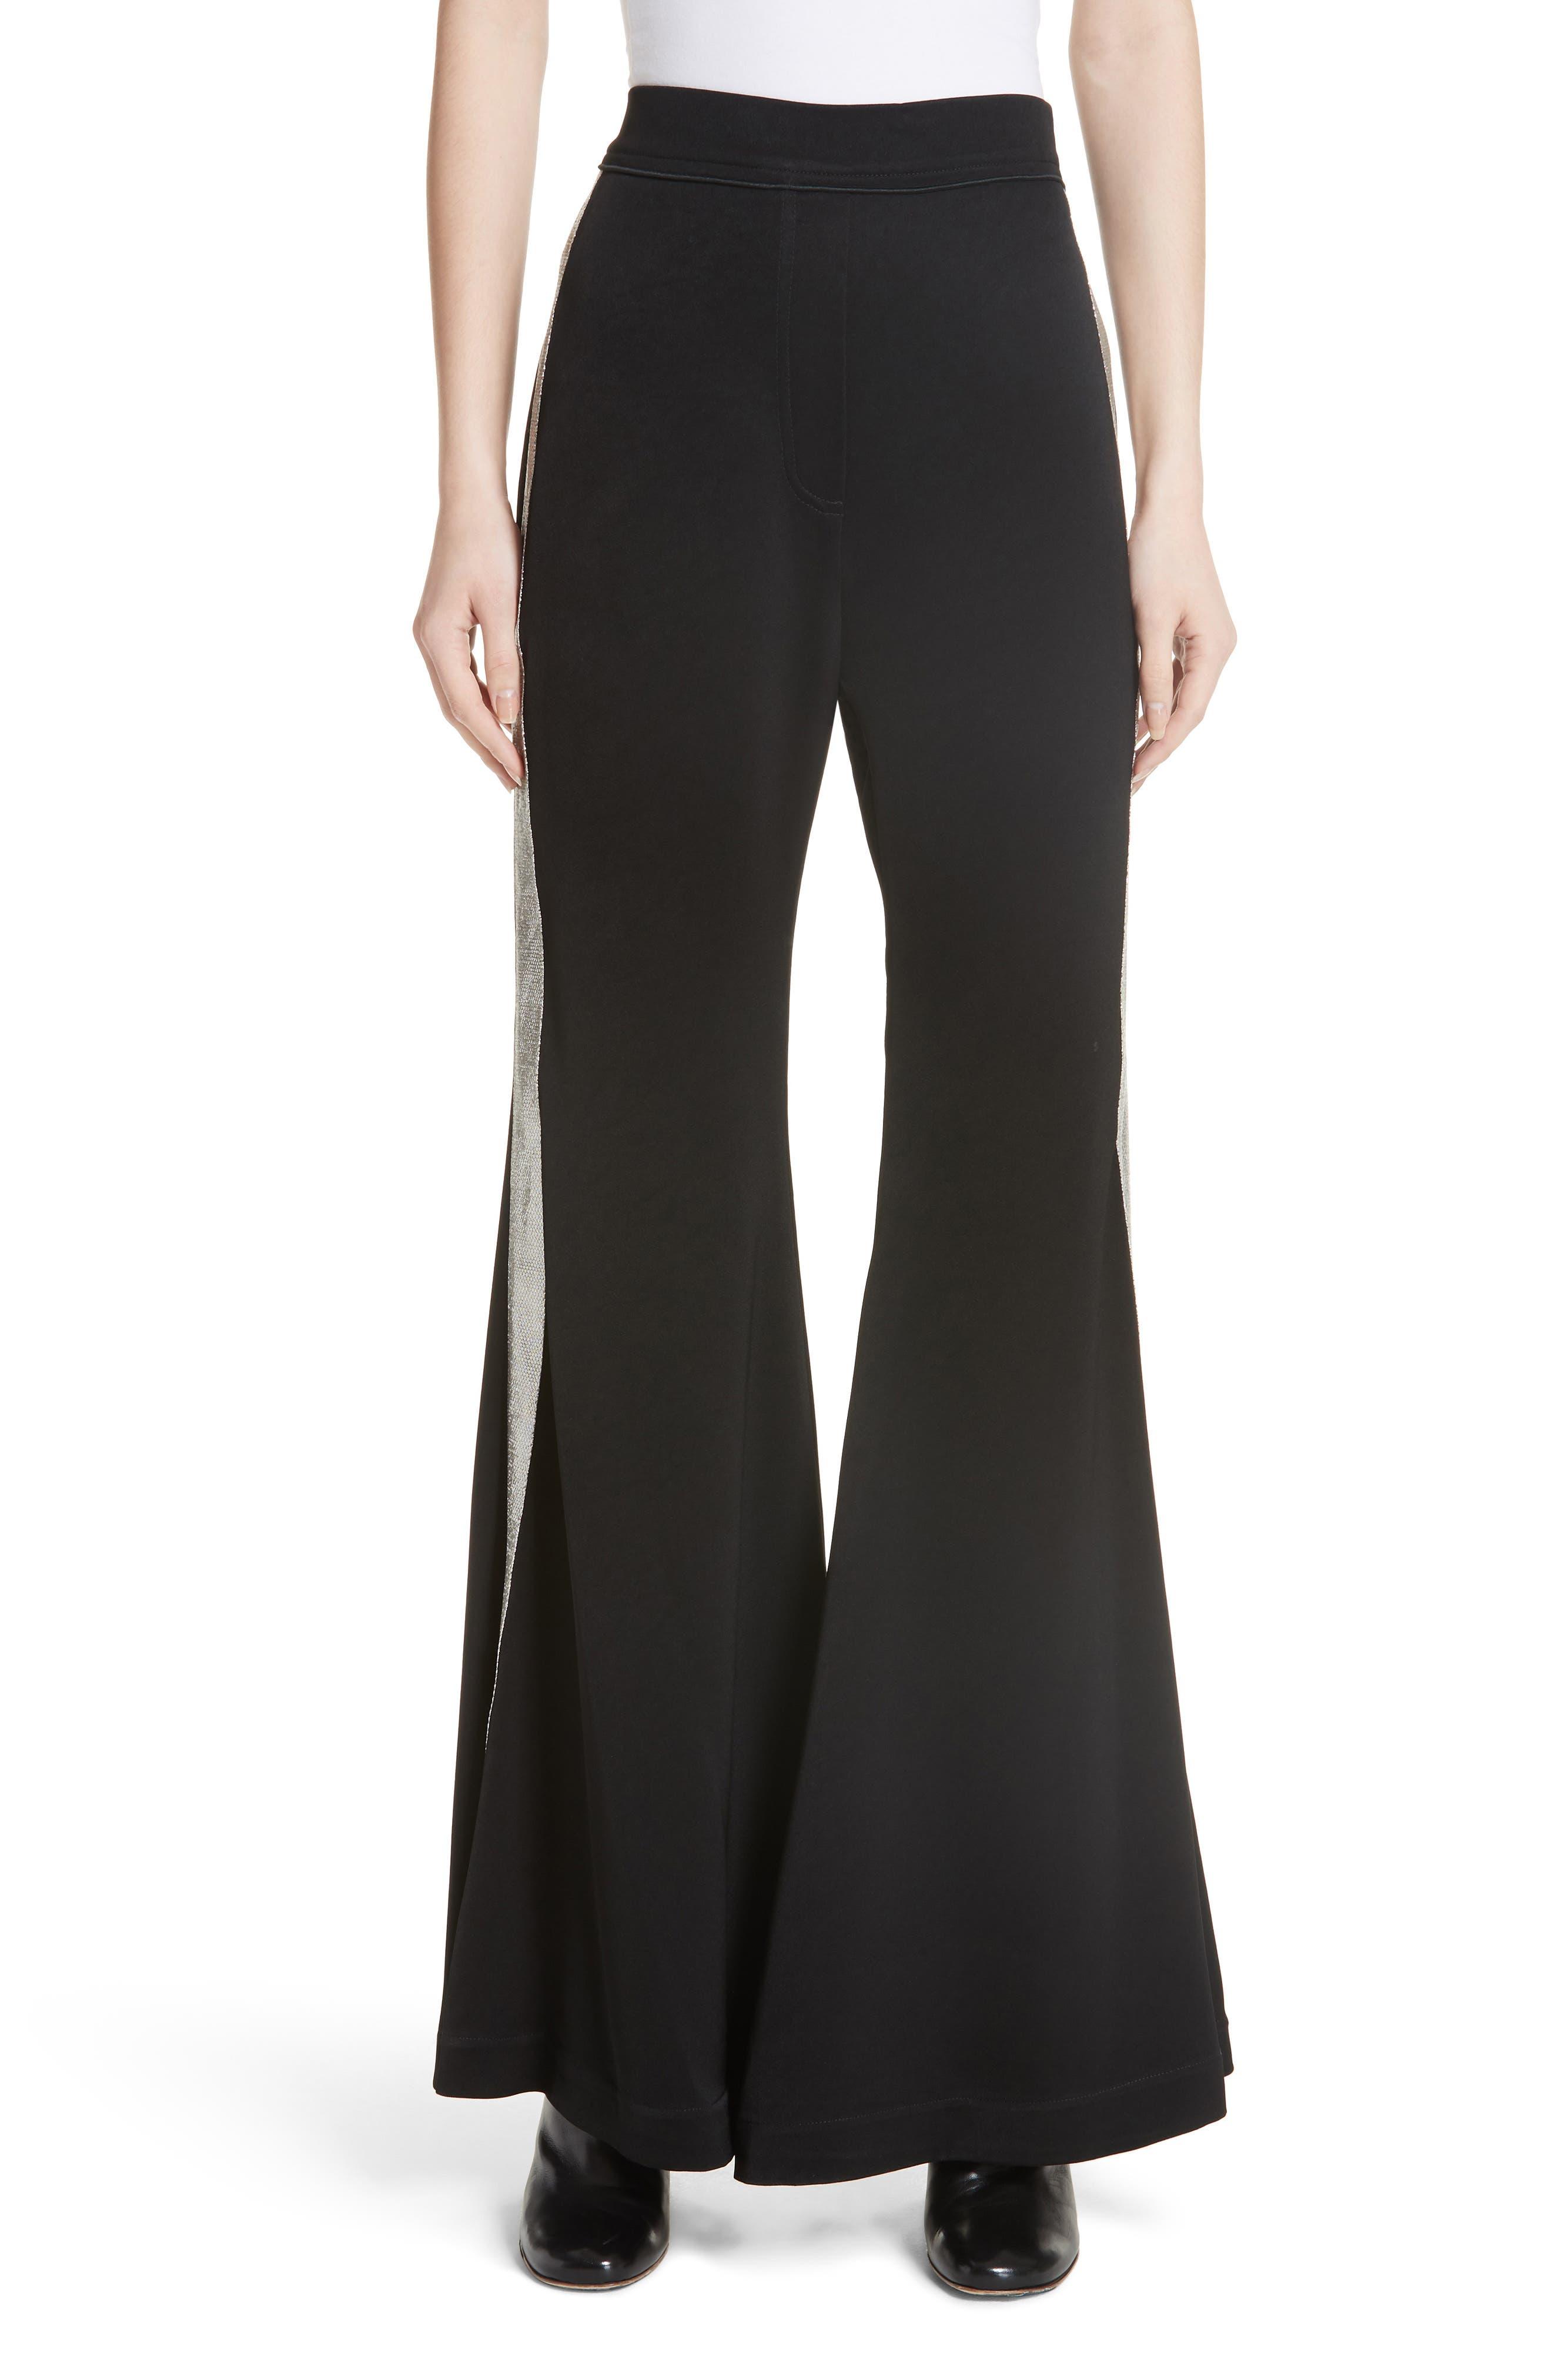 Lovedolls Wide Leg Flare Pants,                         Main,                         color, Black W Silver